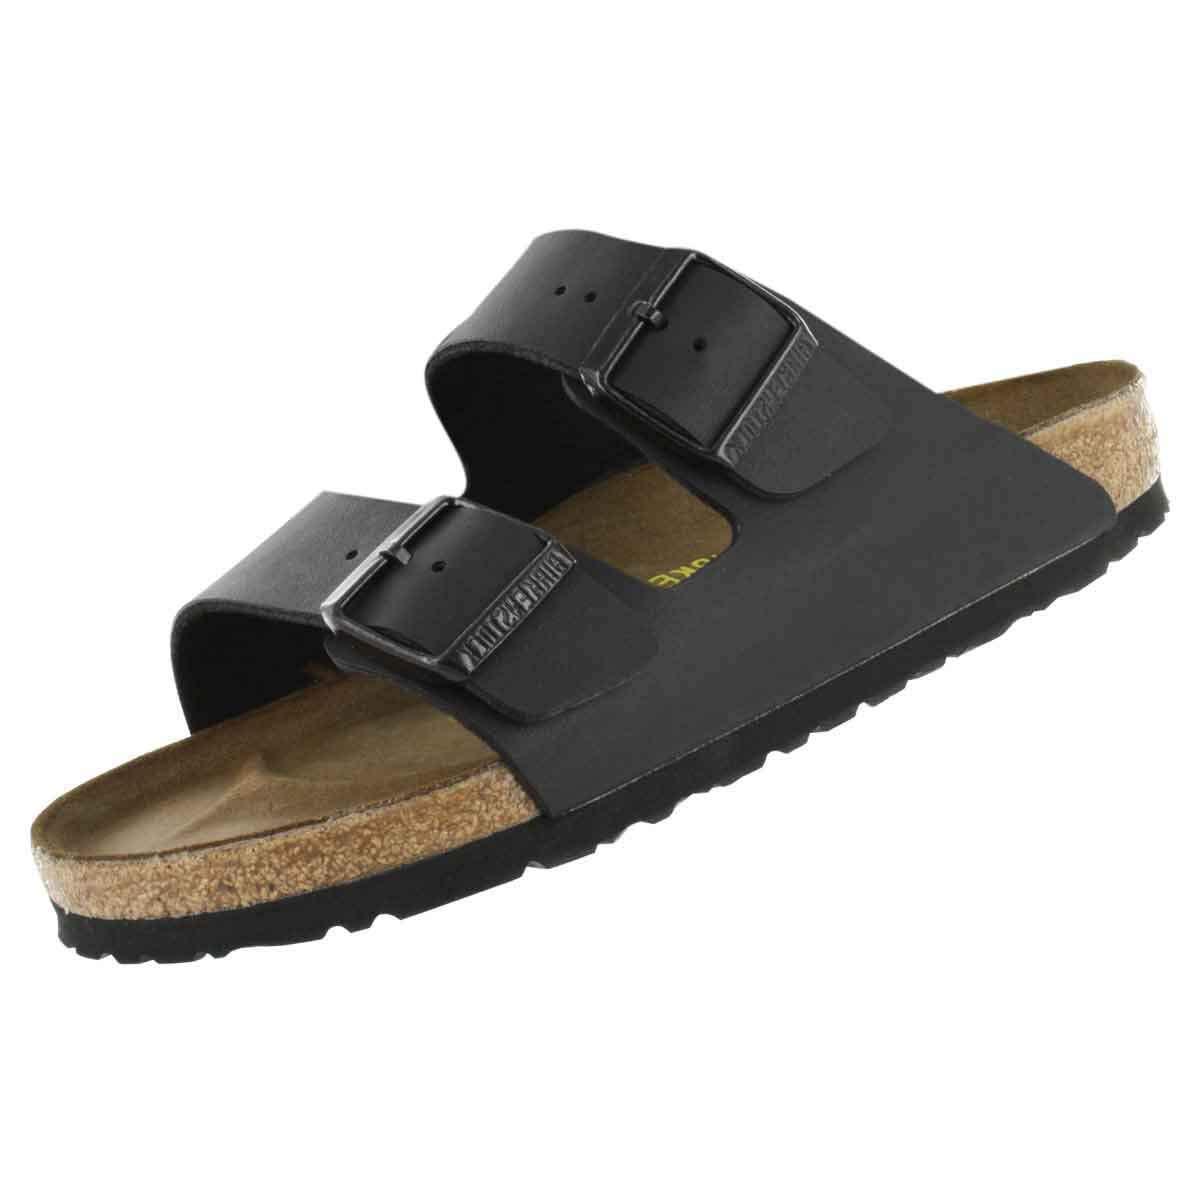 Birkenstock Women's Arizona  Birko-Flo Black Sandals - 47 M EU / 14-14.5 D(M) US